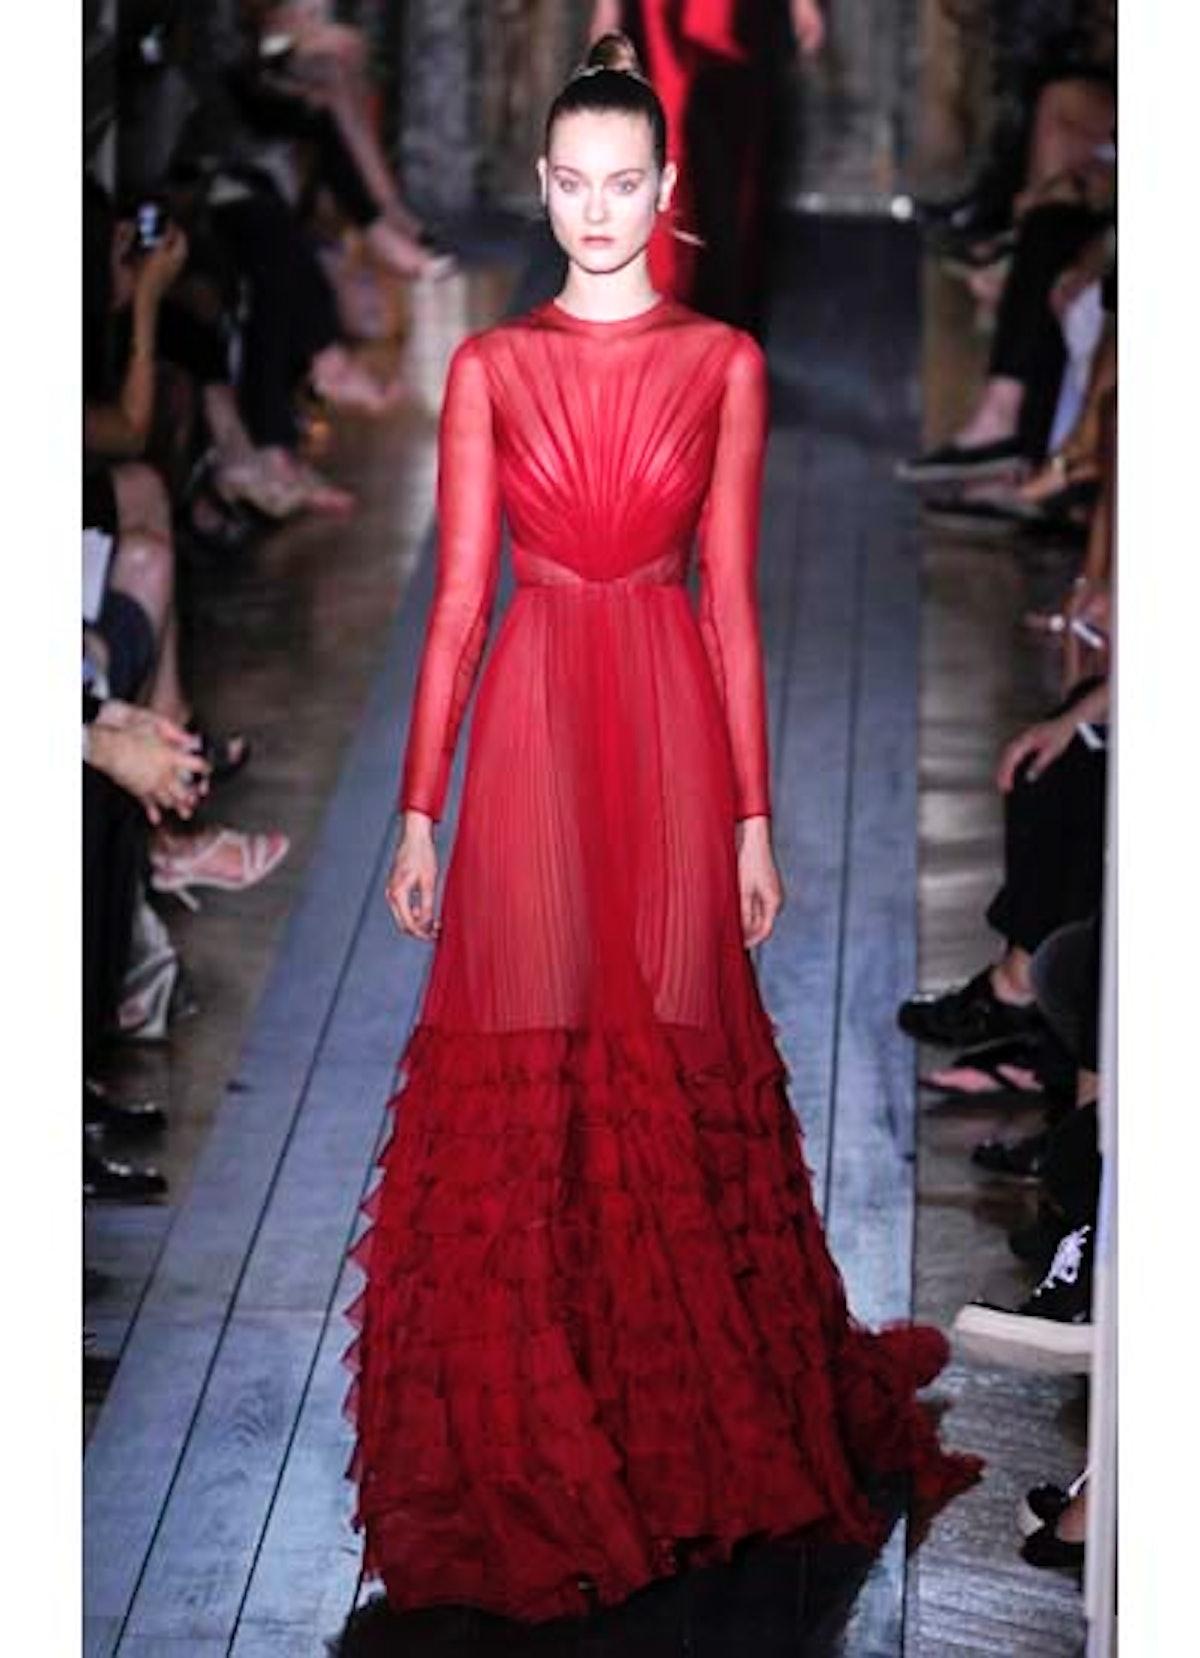 fass-valentino-couture-2012-runway-37-v.jpg